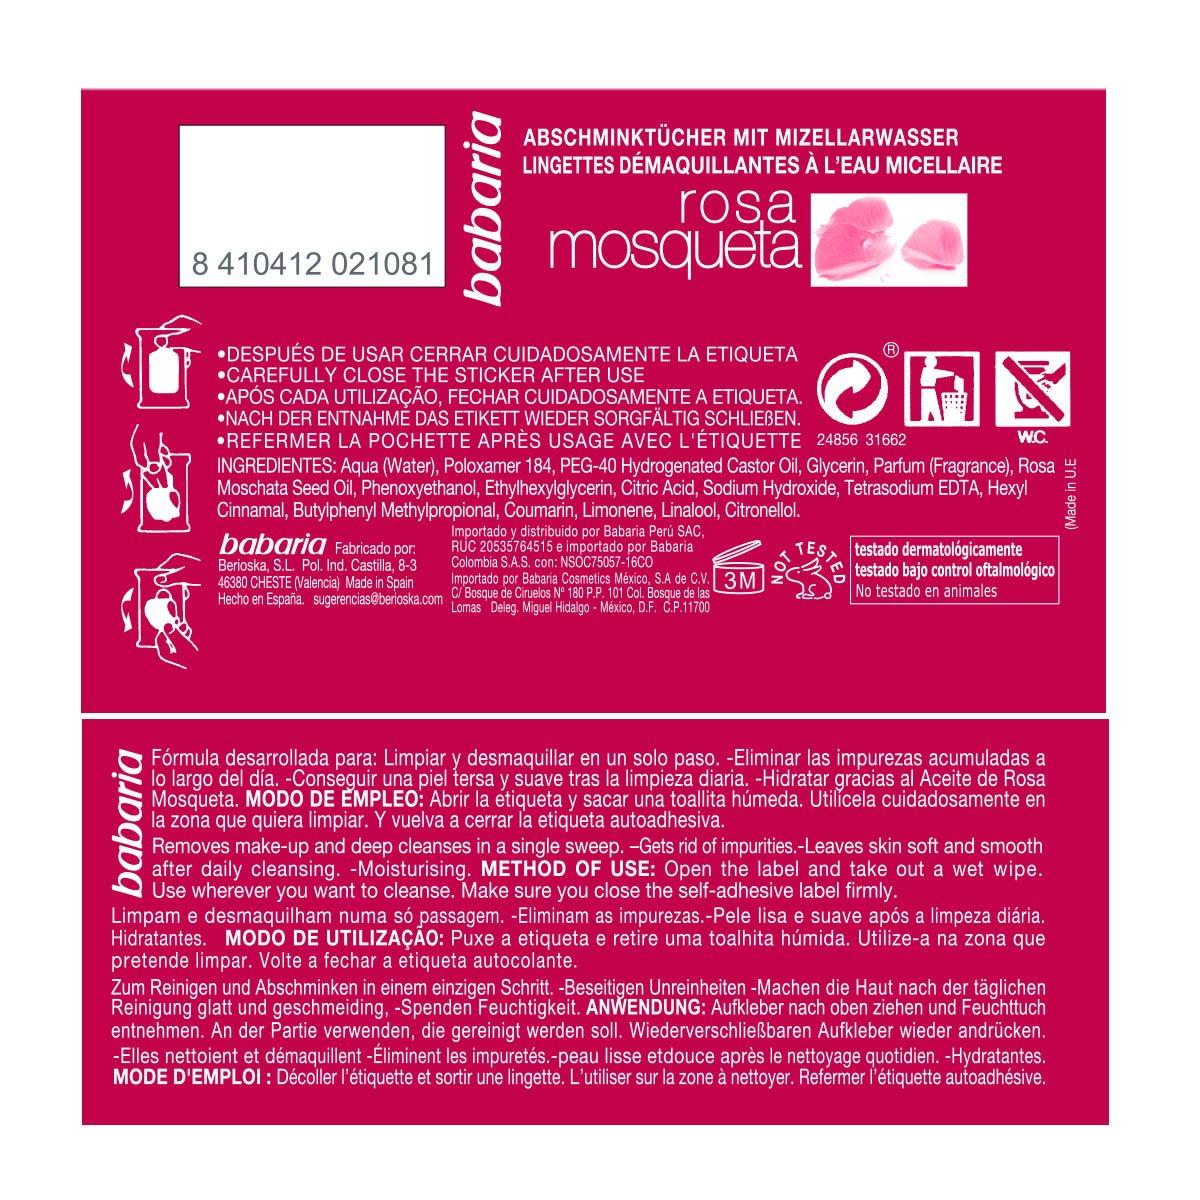 Amazon.com: Barbaria Vital Skin Wipes Pack pads Micellar Water 20Unidades: Beauty